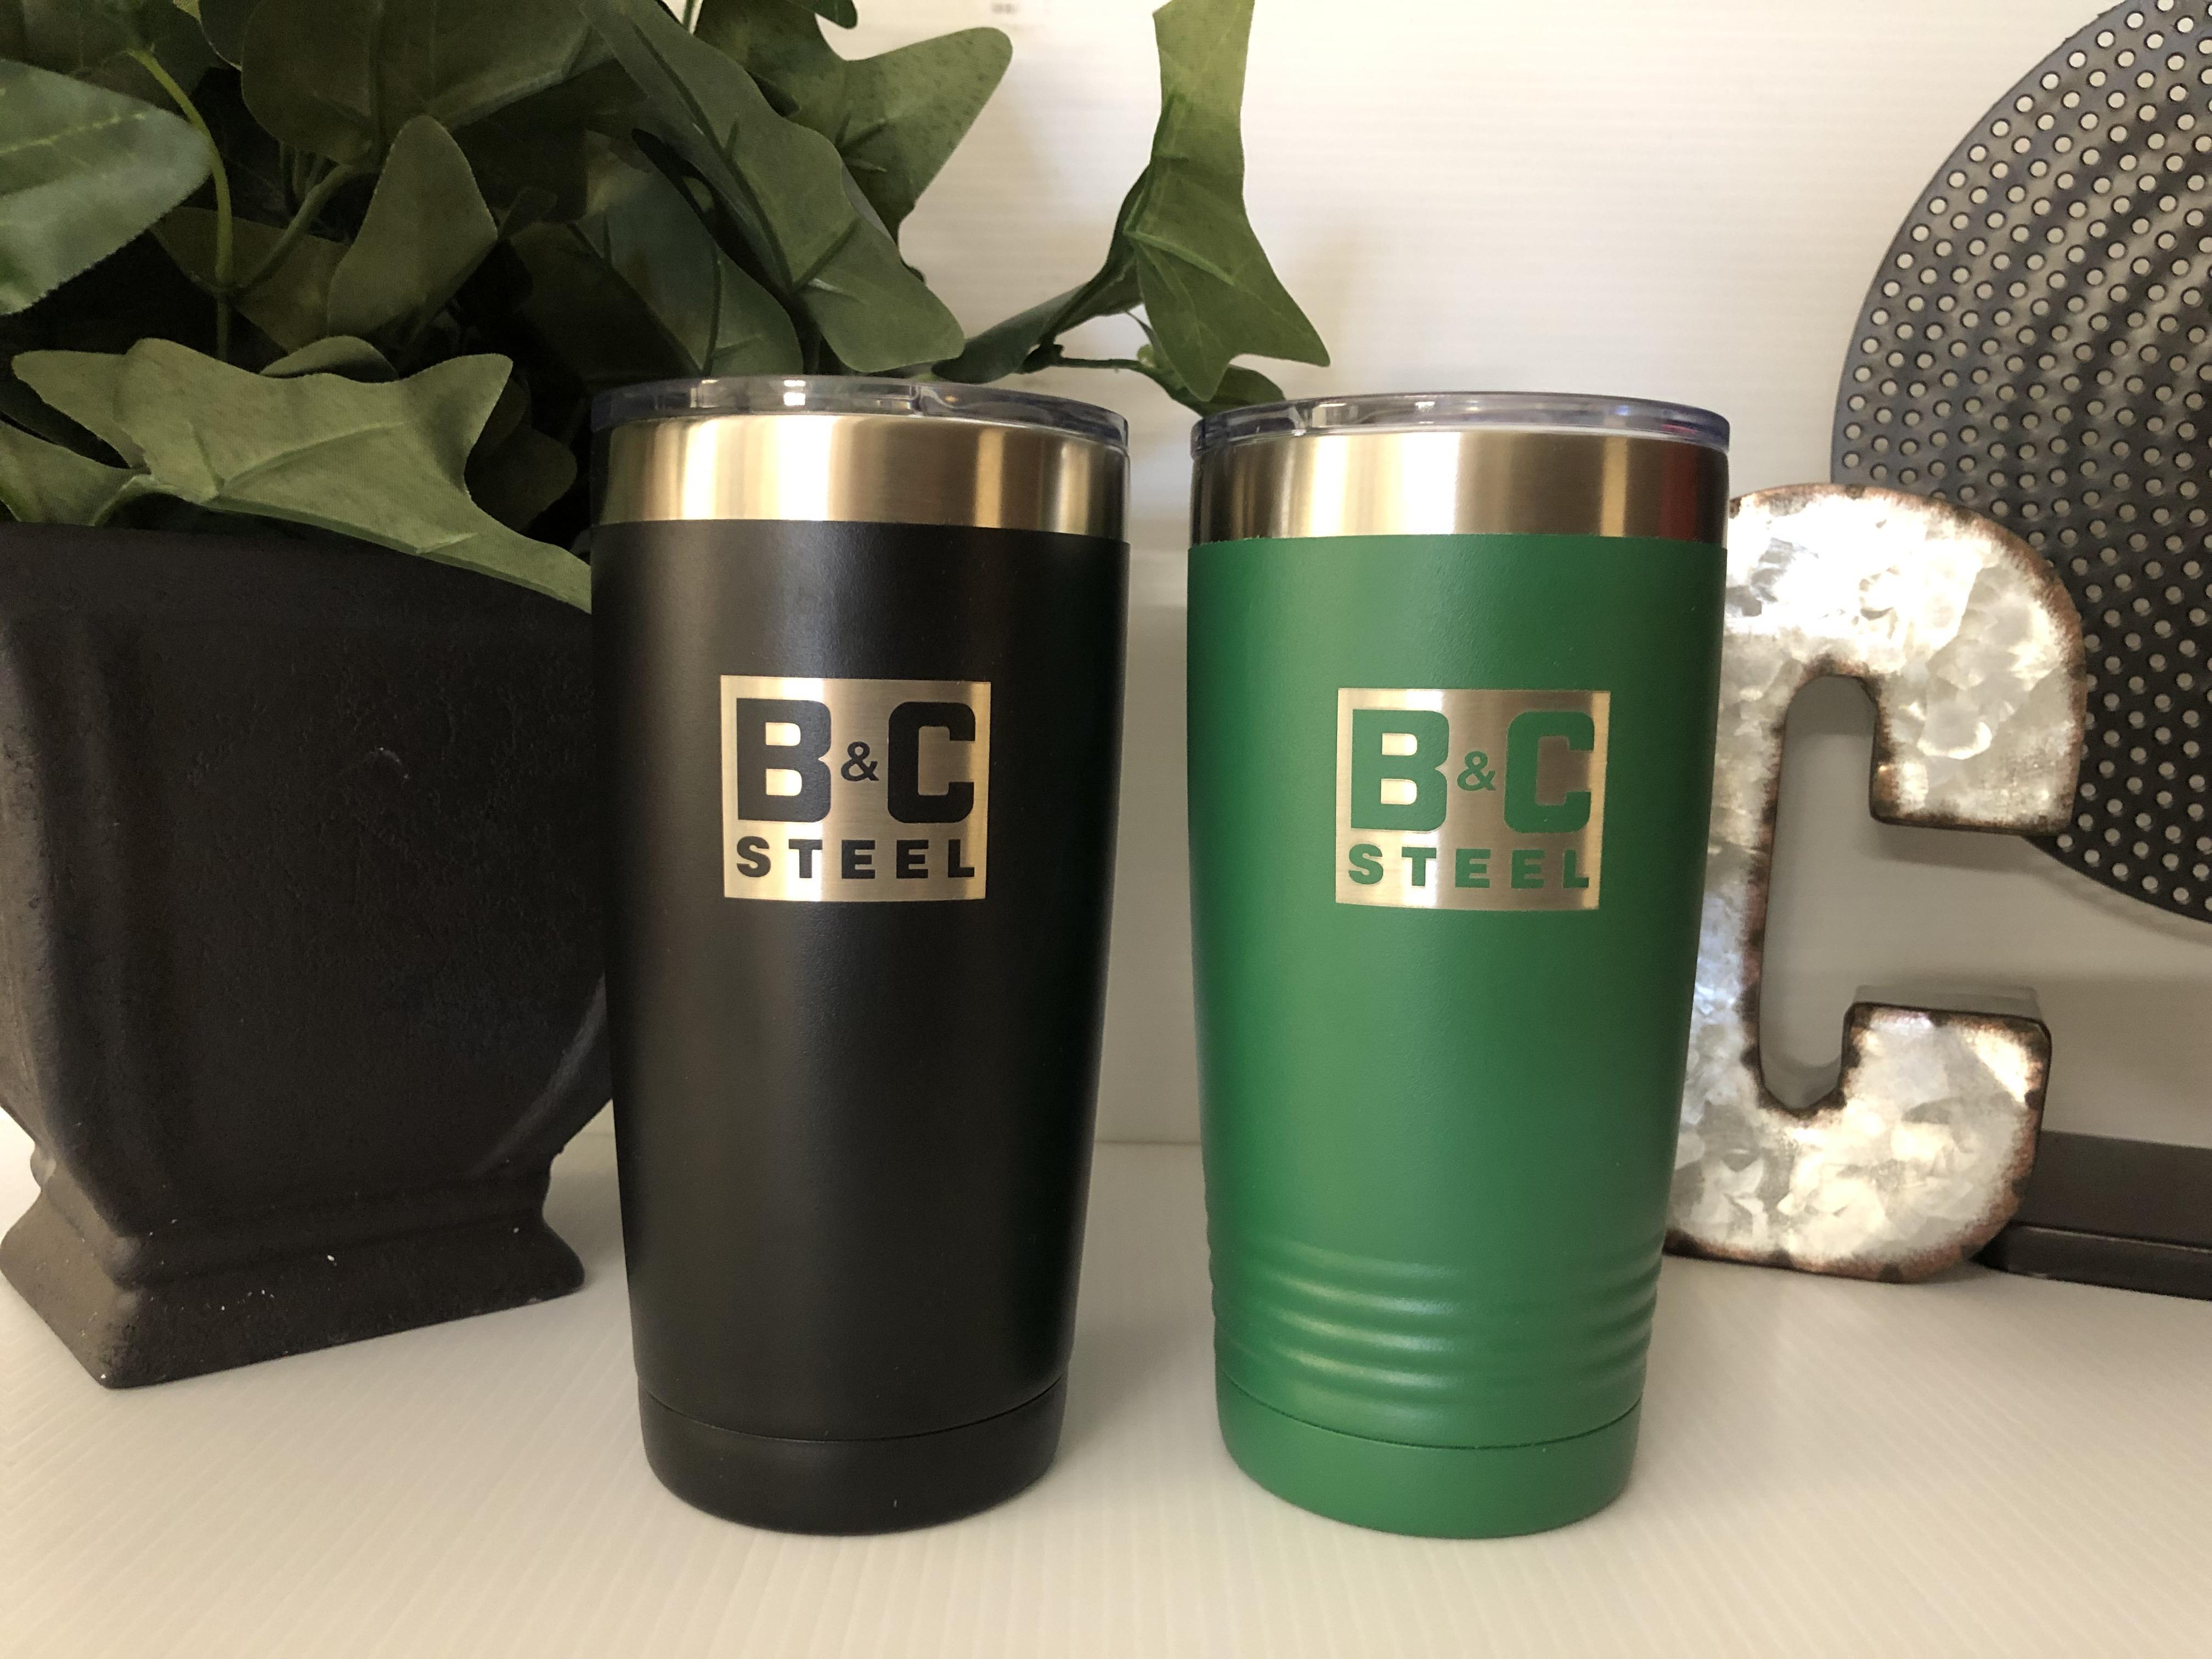 B&C Steel Mugs